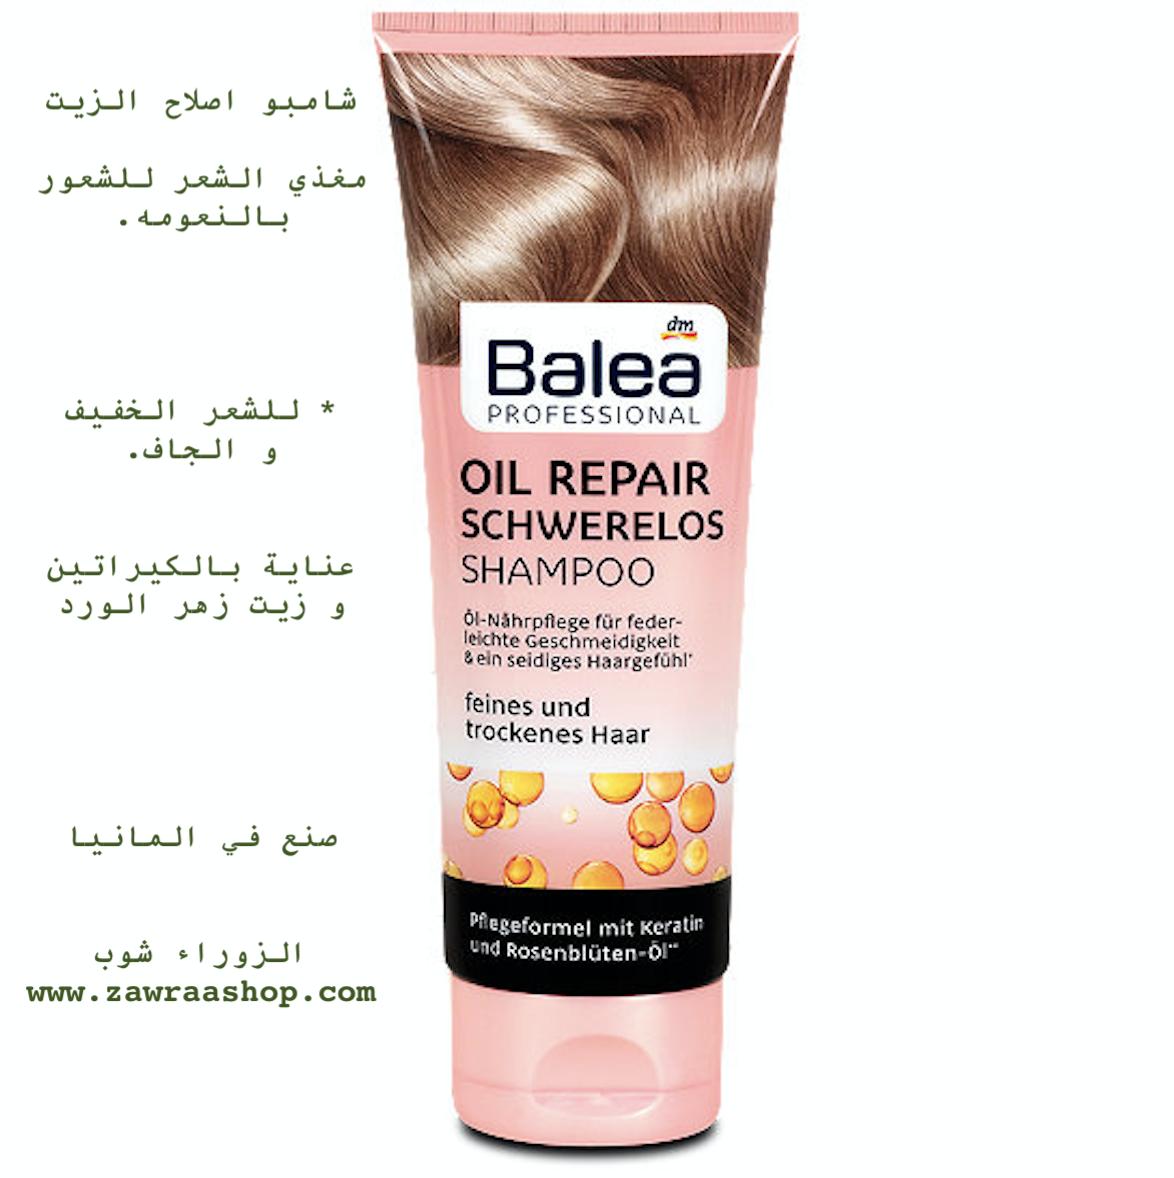 B407 oil repair schwerelos shampoo شامبو عصارة ٢٥٠ مل للشعر التالف 00450